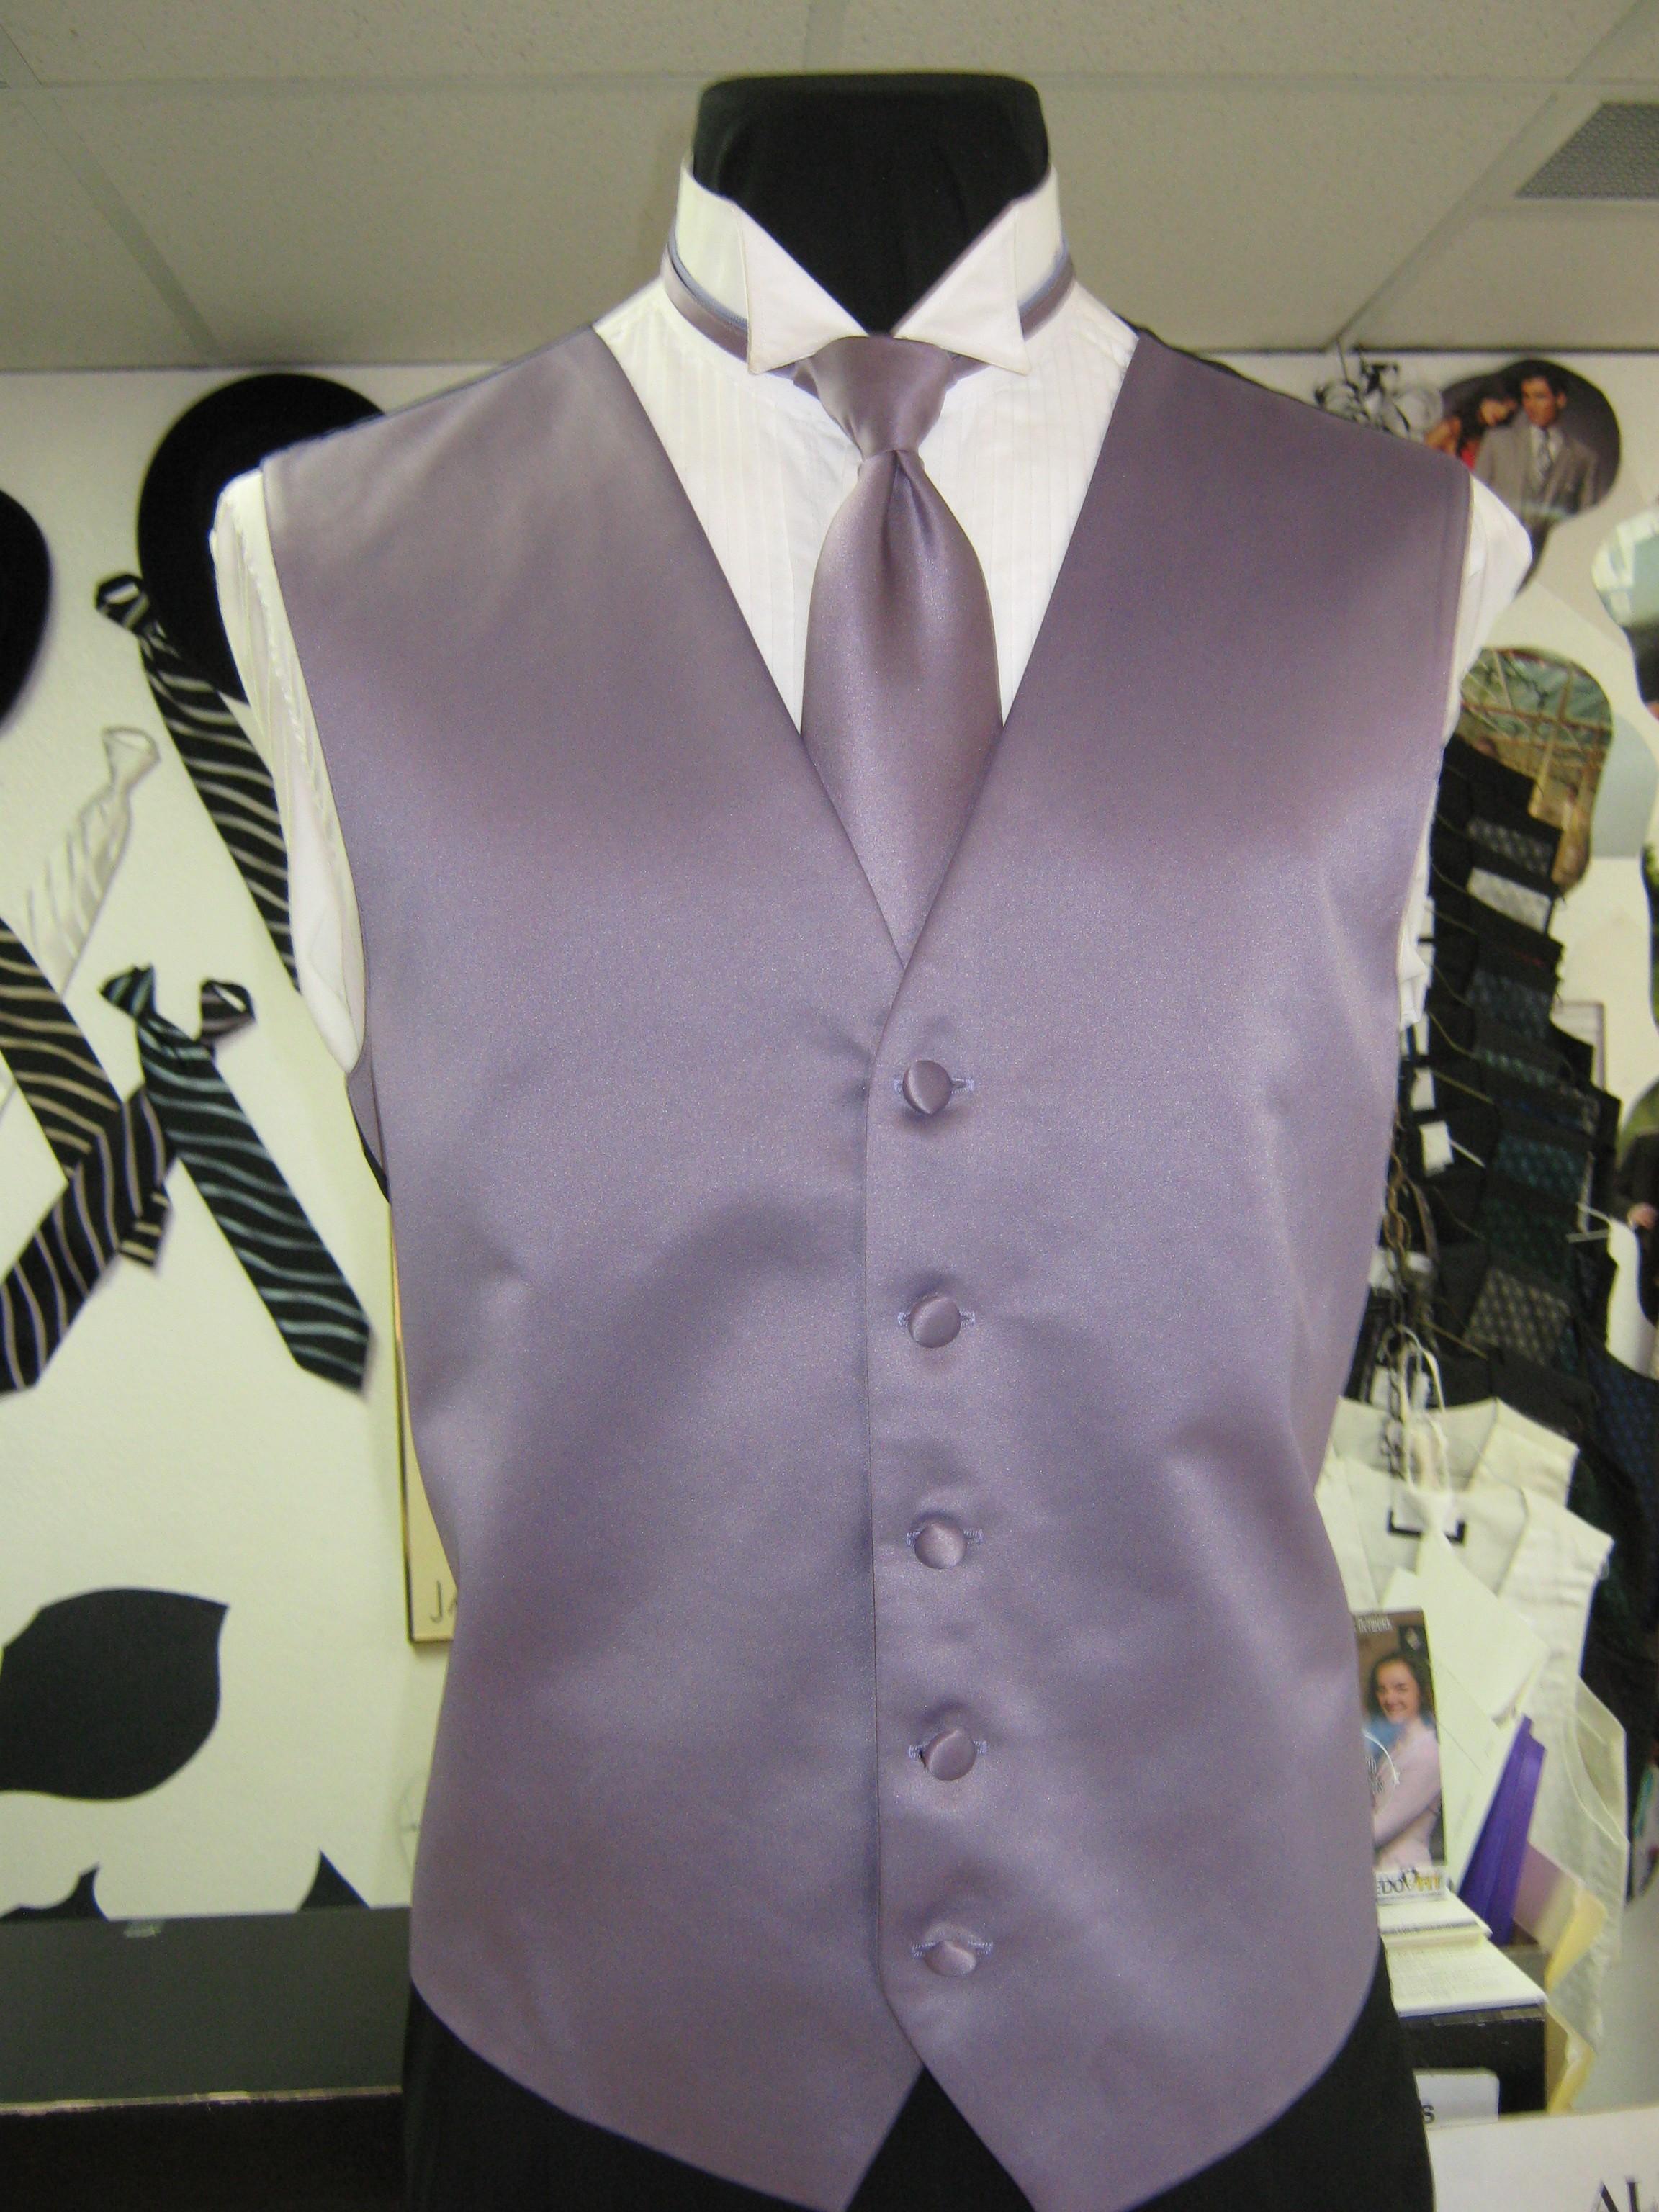 Formal Wear Vest And Tie Rose Tuxedo Wedding Tuxedo